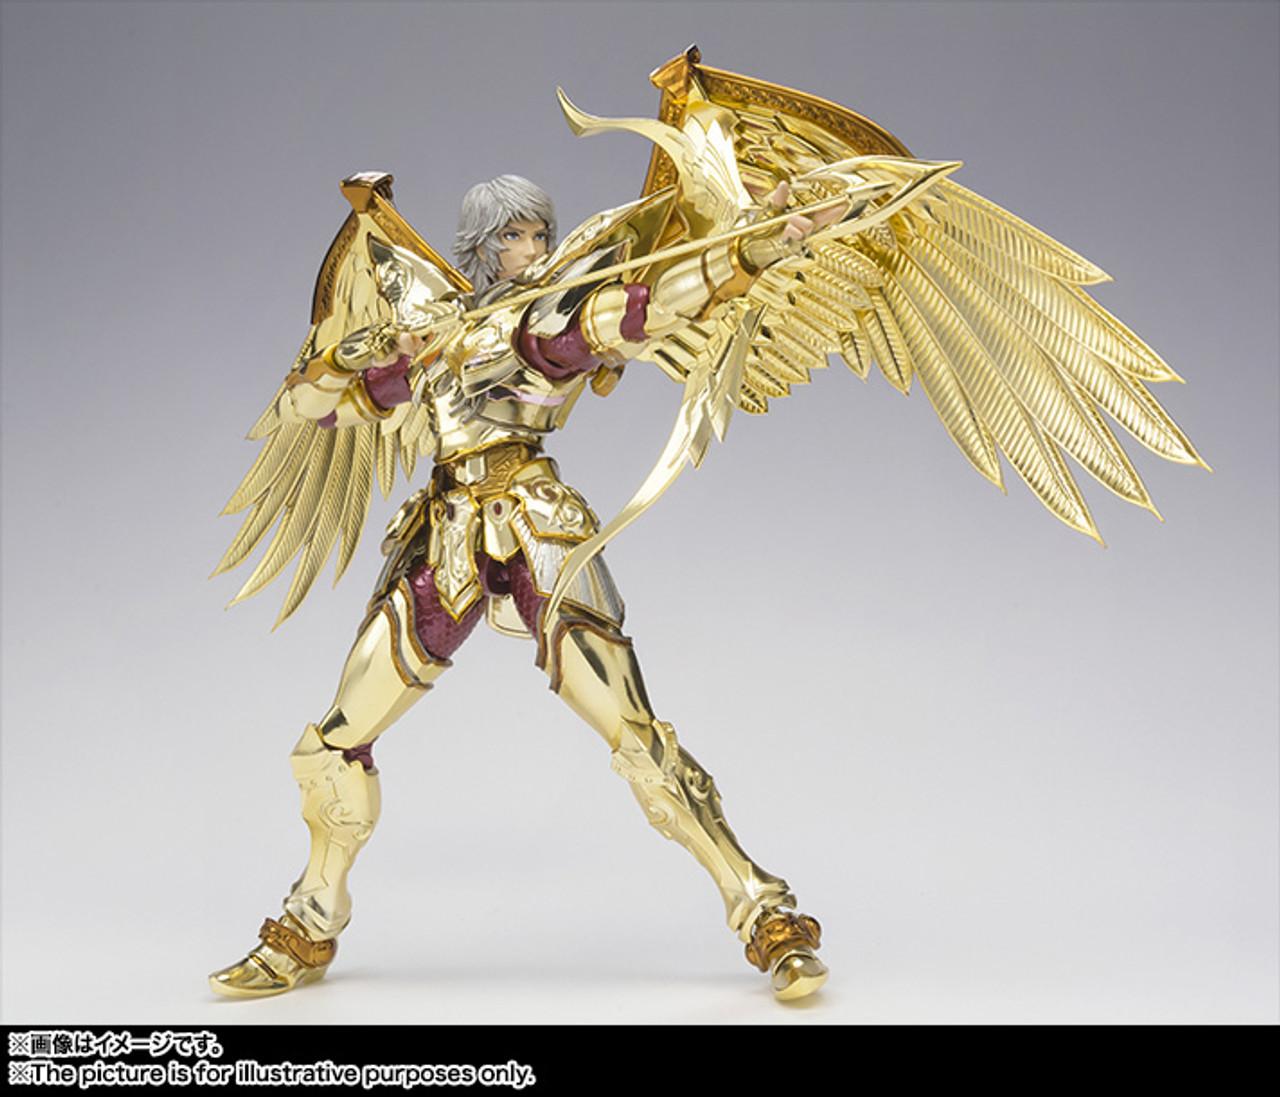 Bandai Saint Seiya Sagittarius Aeolus God Cloth Saint Cloth Myth EX Soul of Gold